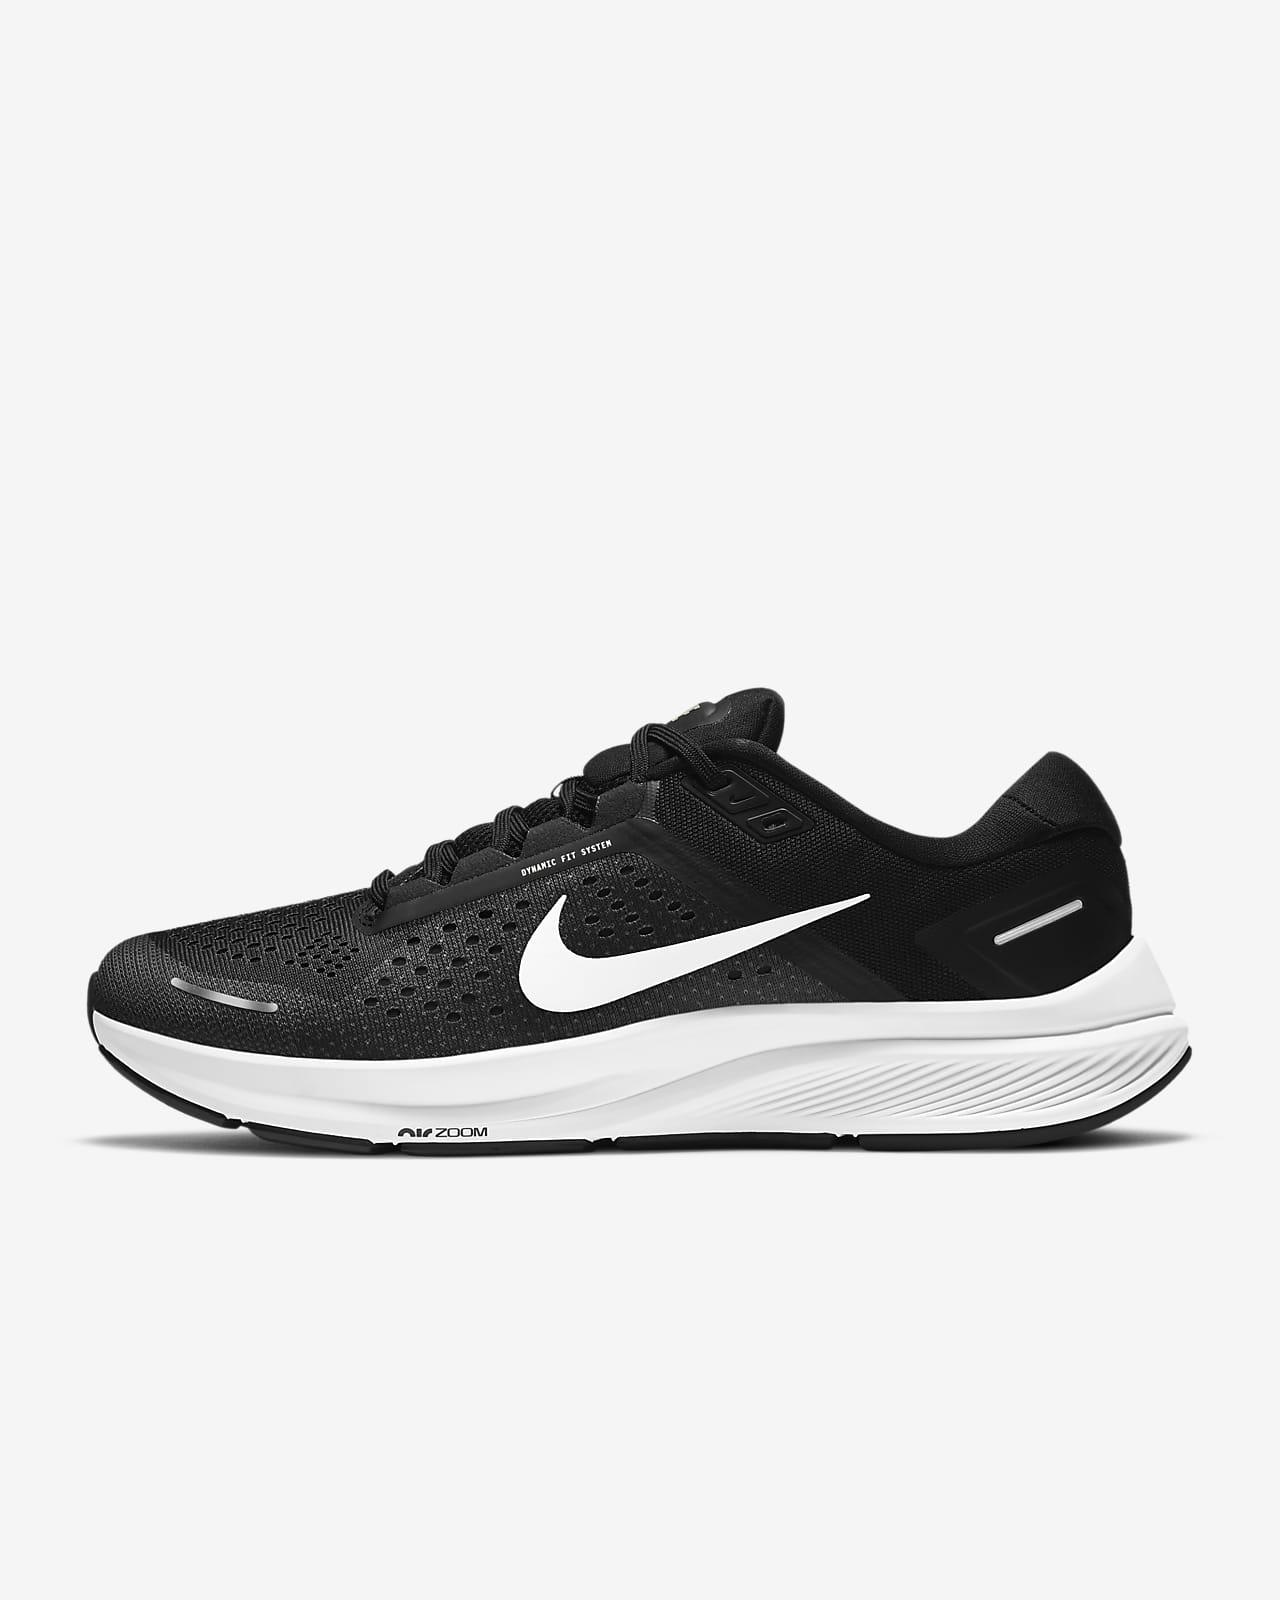 Chaussures de running sur route Nike Air Zoom Structure 23 pour Homme